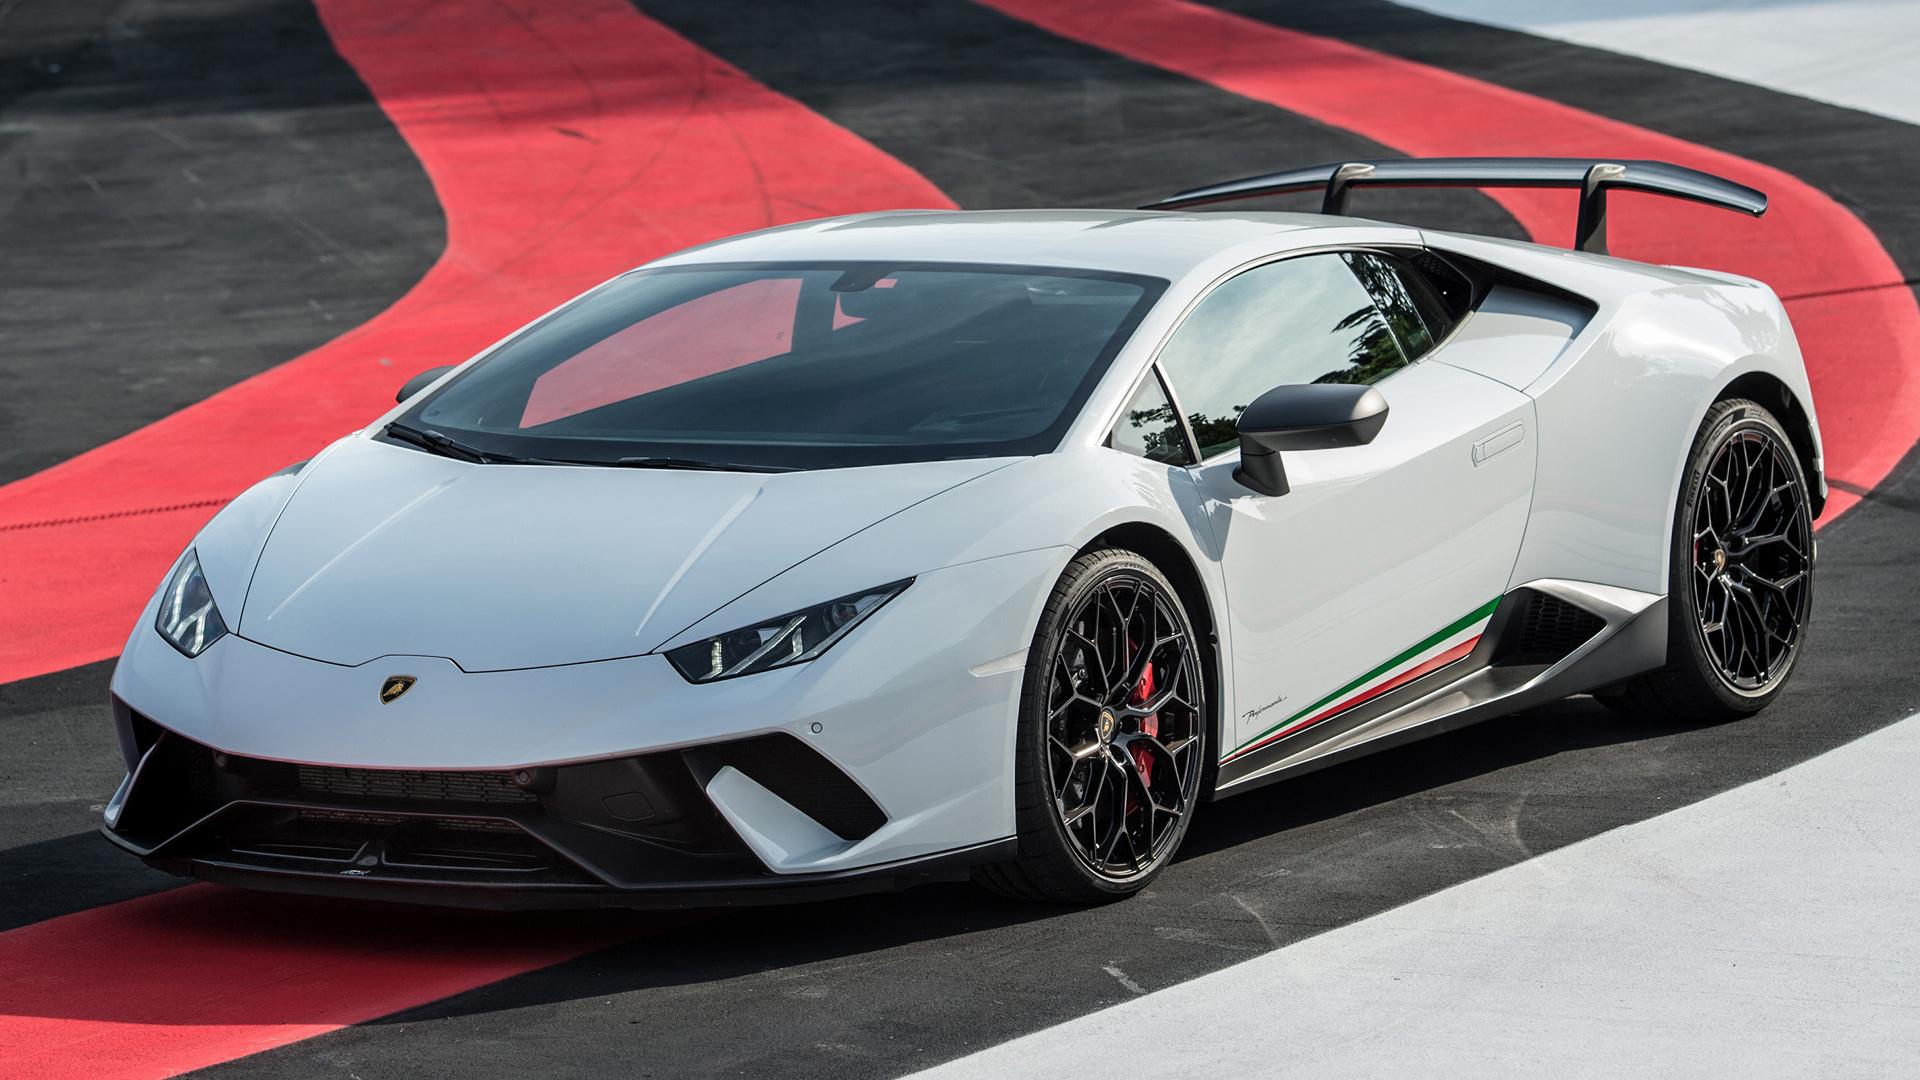 2017 Lamborghini Huracan Performante Wallpapers And Hd Images